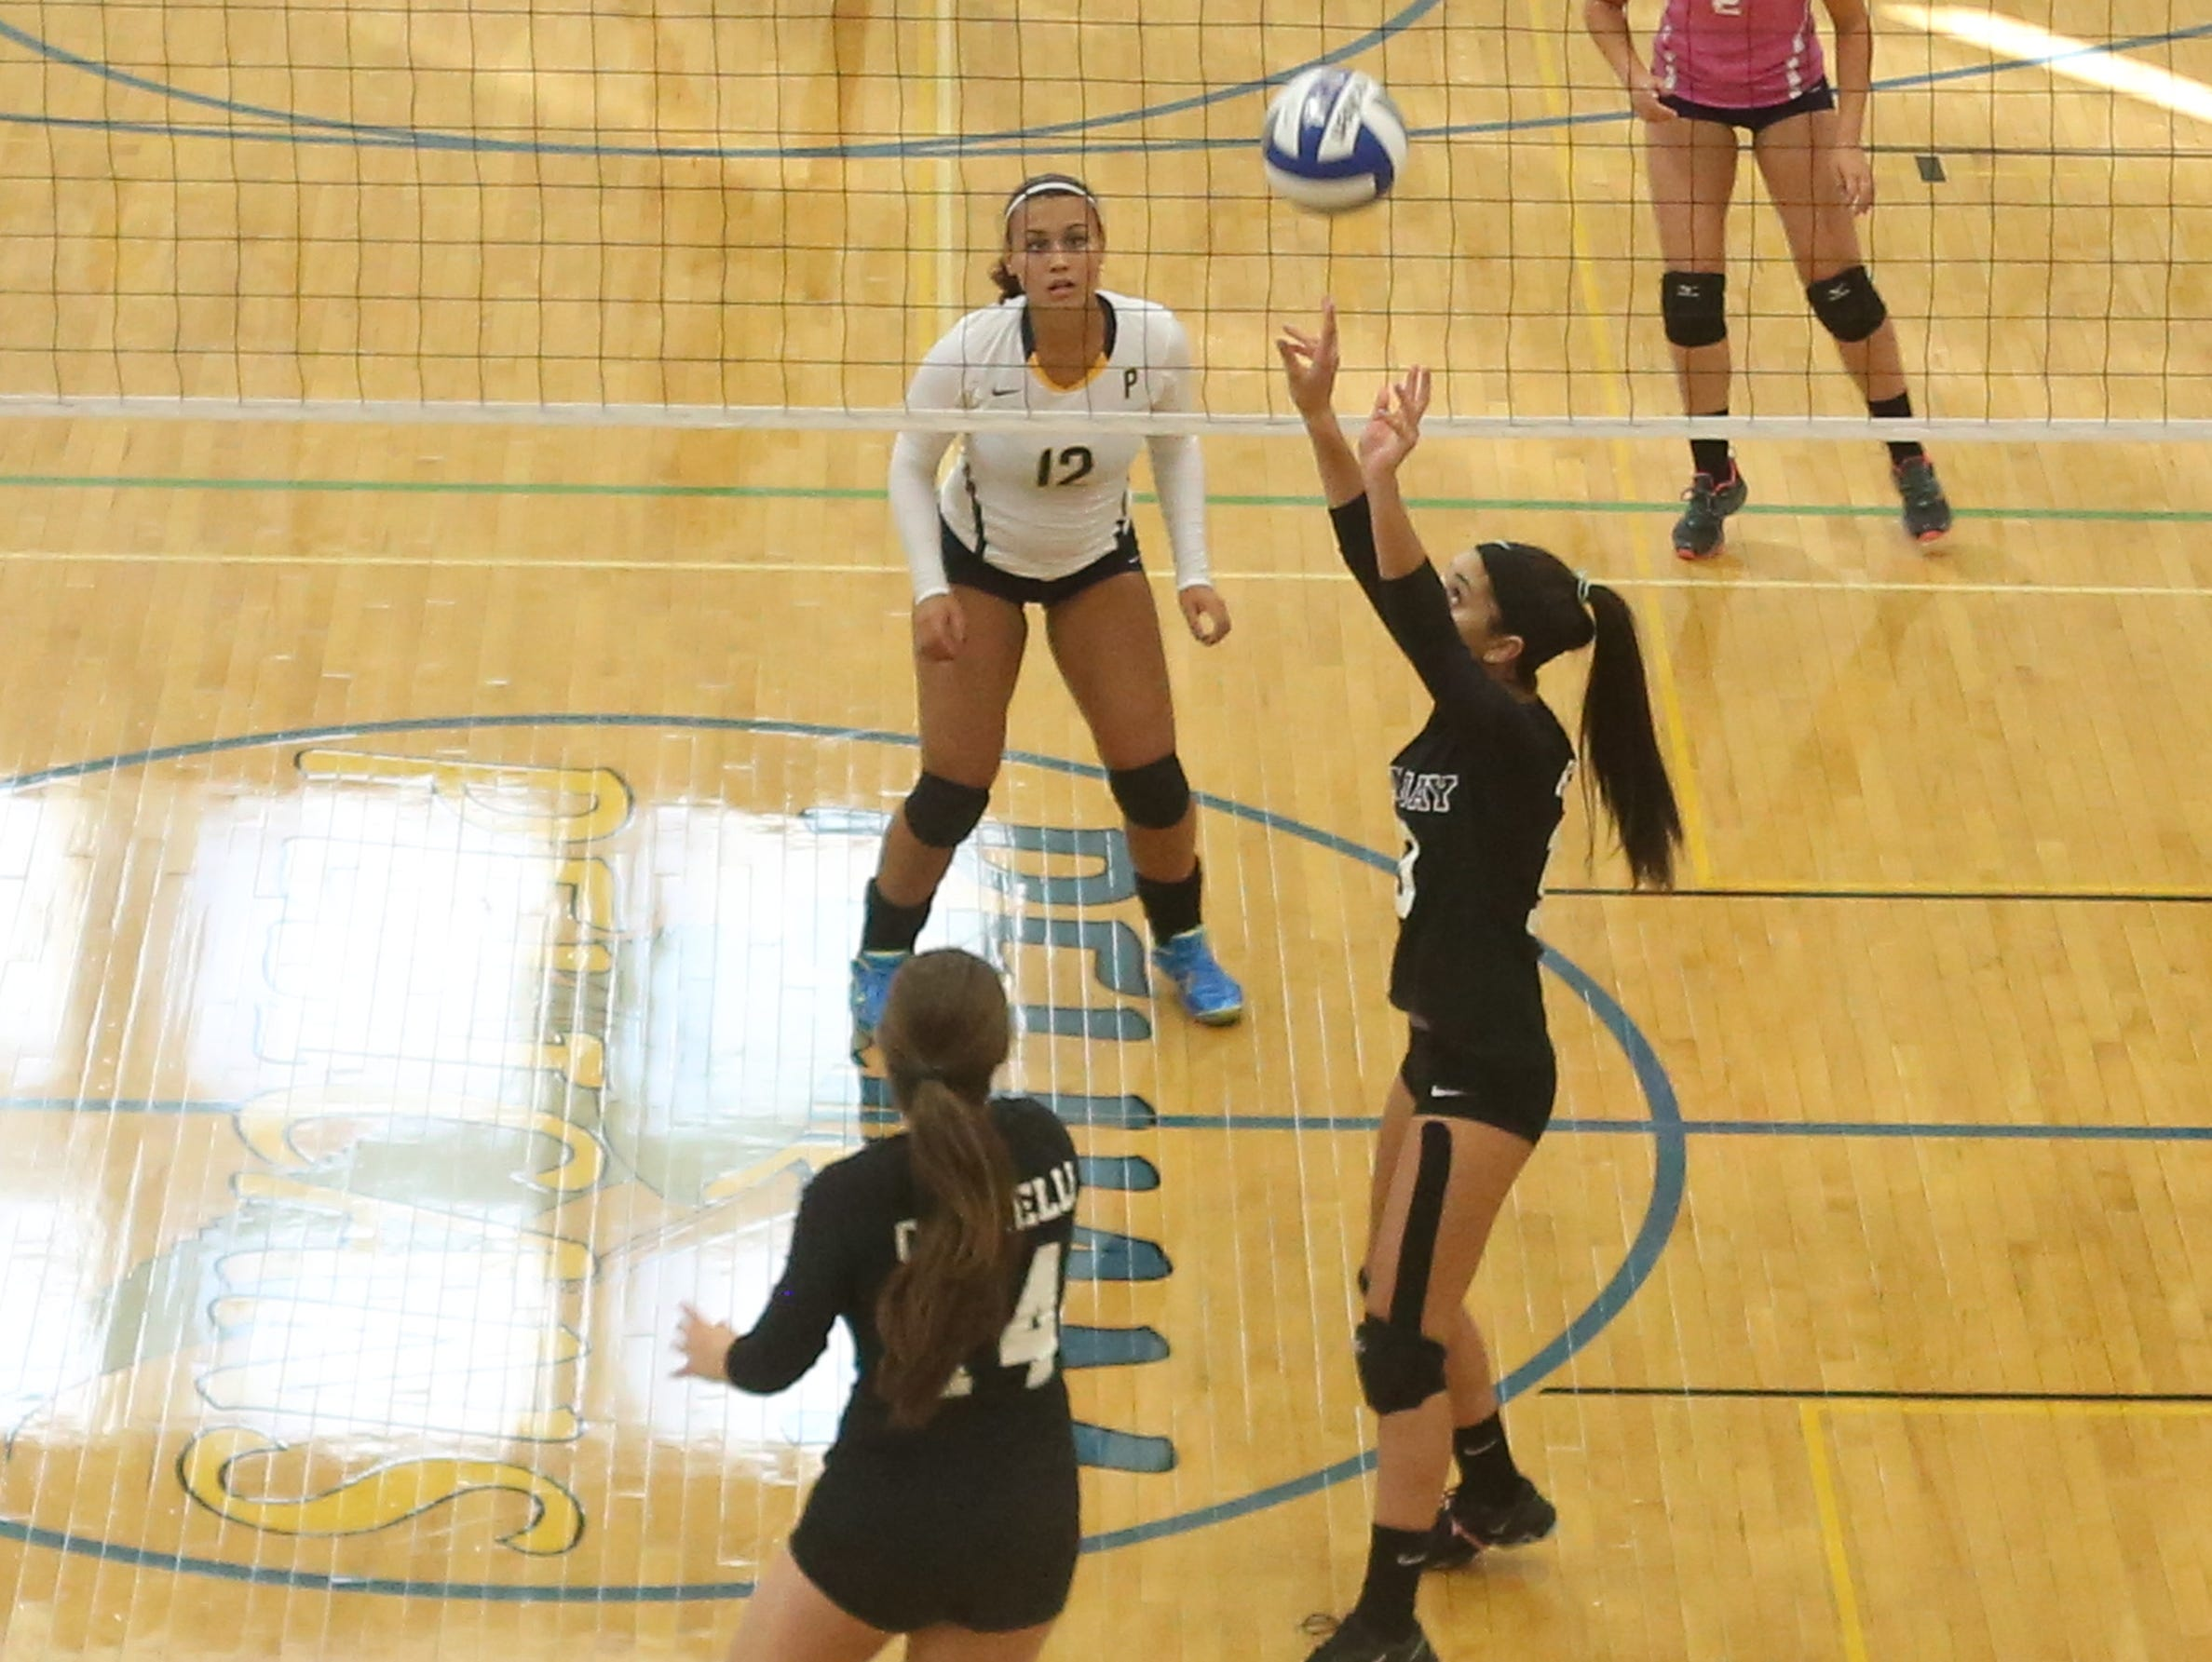 John Jay's Katie Mines sets up a shot for Rachel Cifarelli during a varsity volleyball match against Pelham at Pelham High School Sept. 3, 2015.